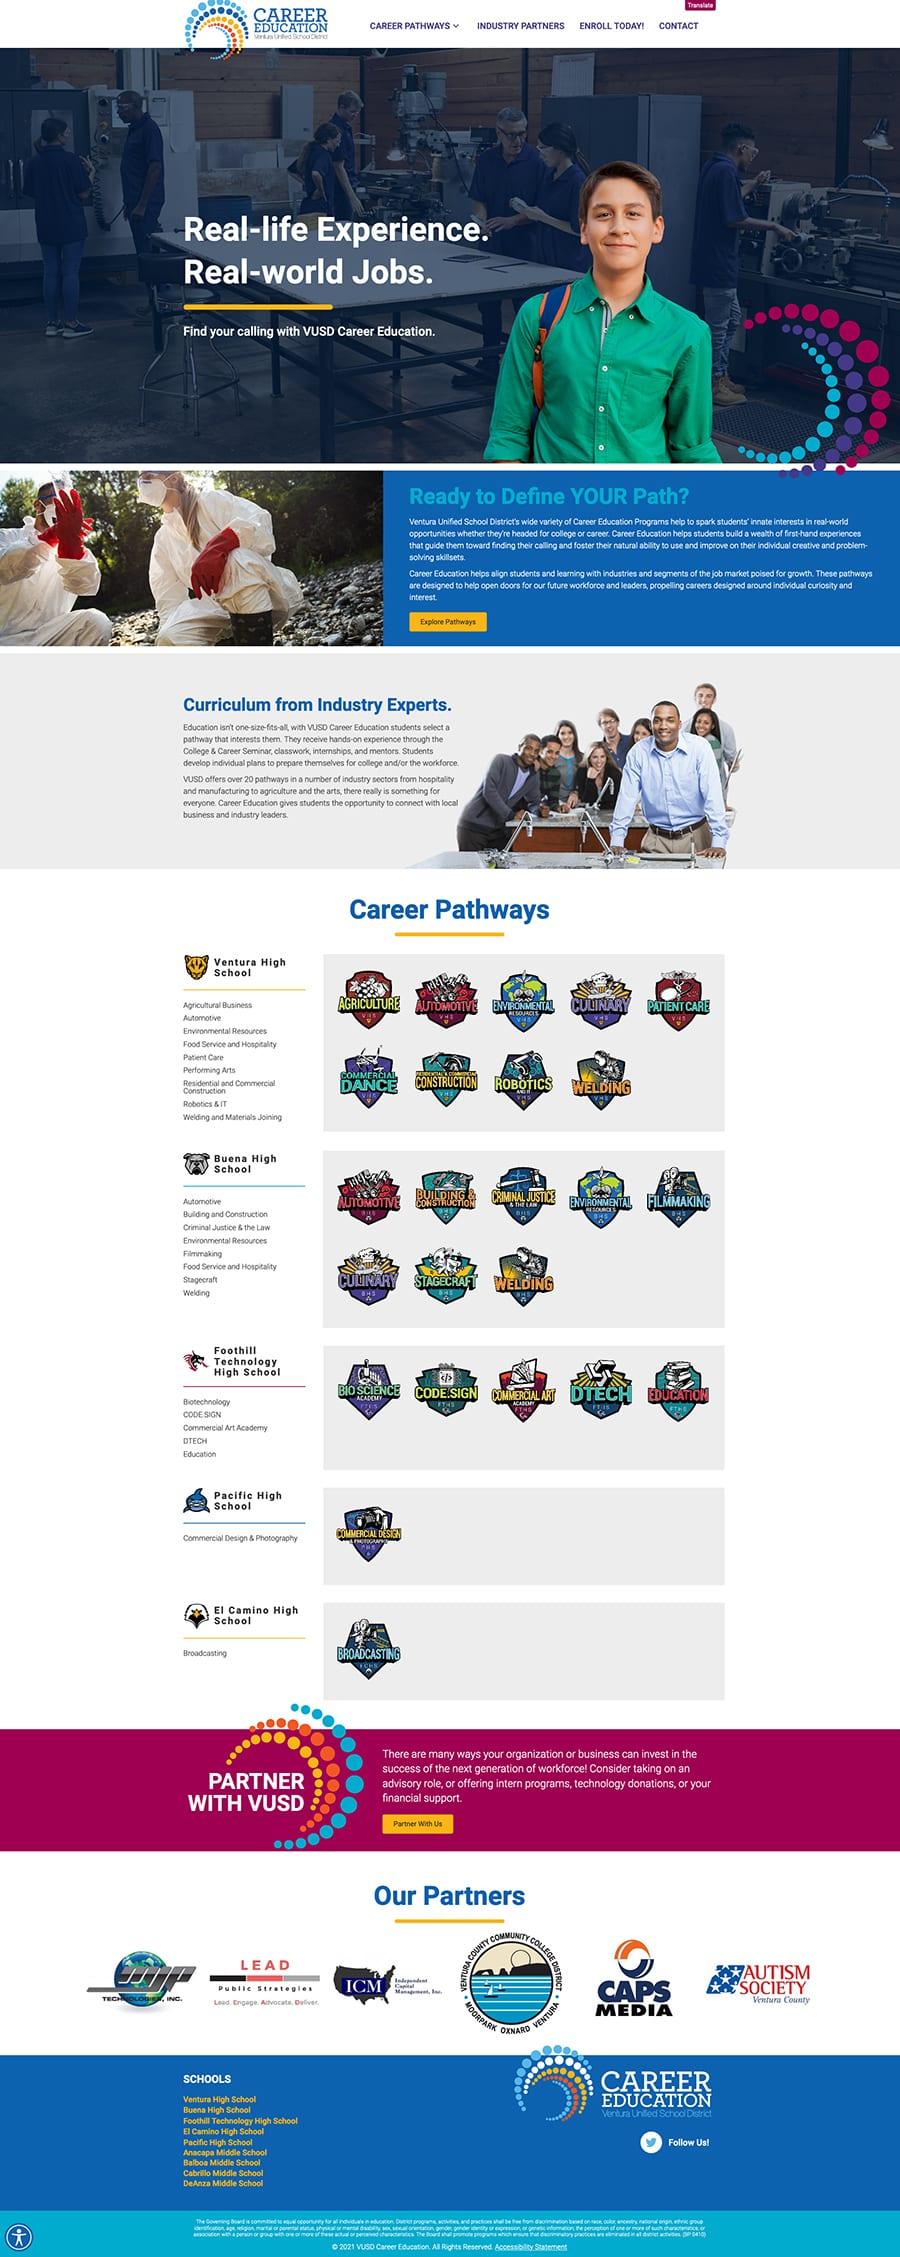 Fullscreen screenshot of VUSDCareerEducation.org's home page